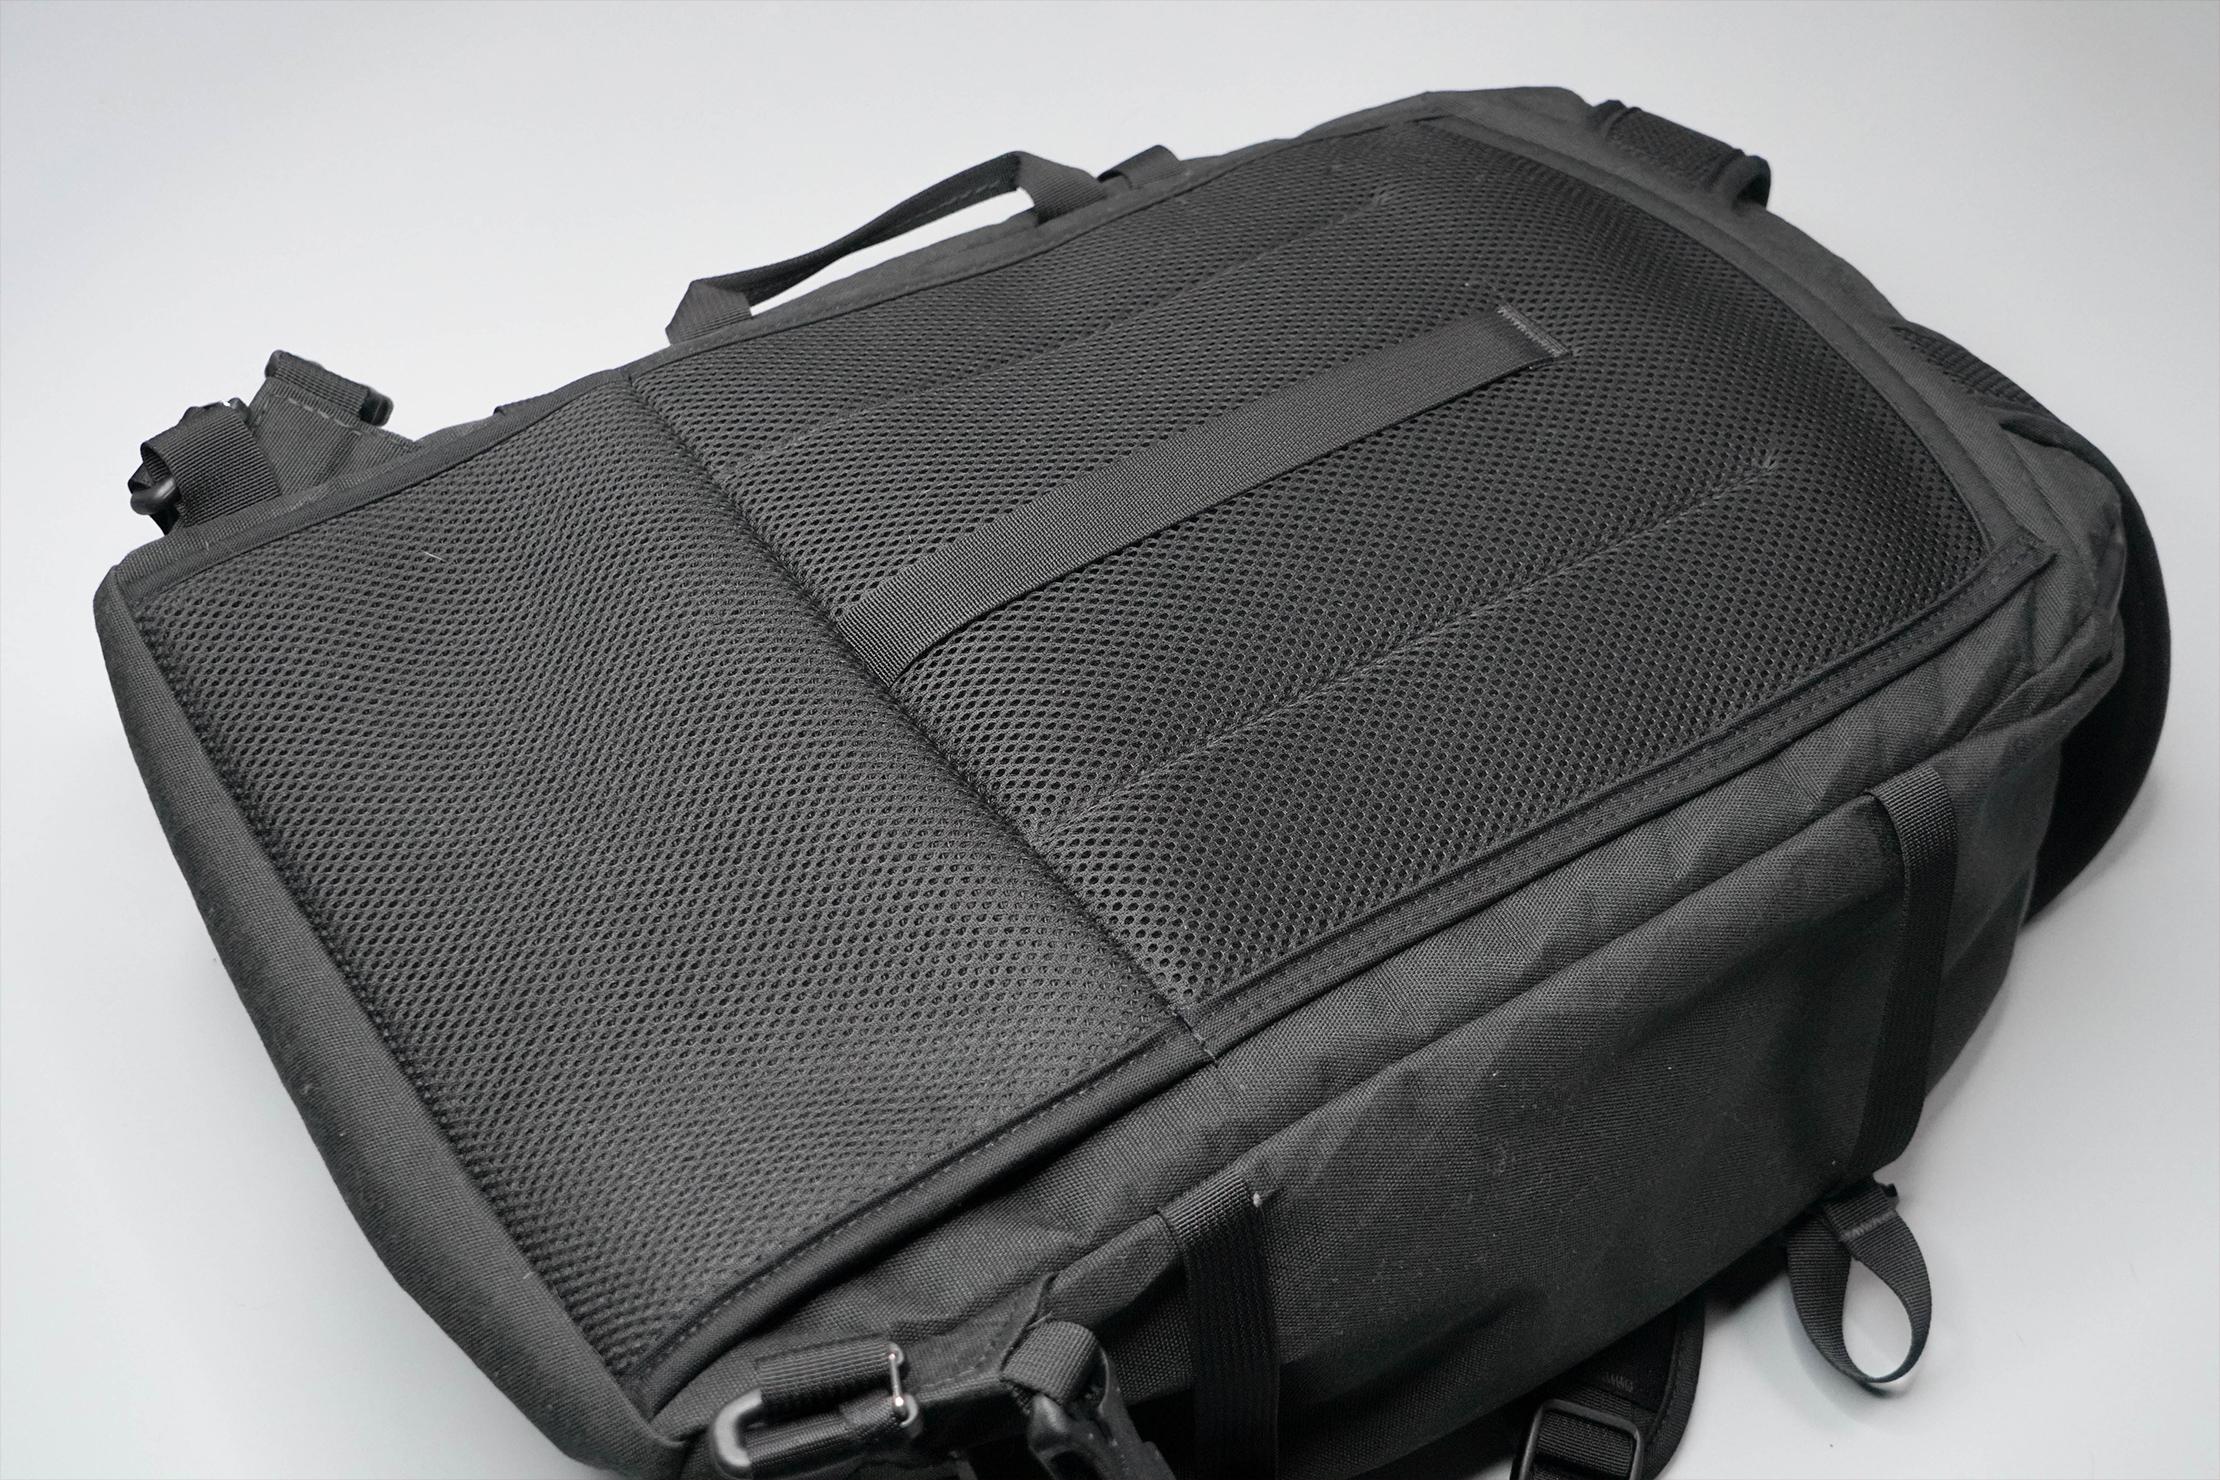 North St. Bags Weekender Backpack Back Panel